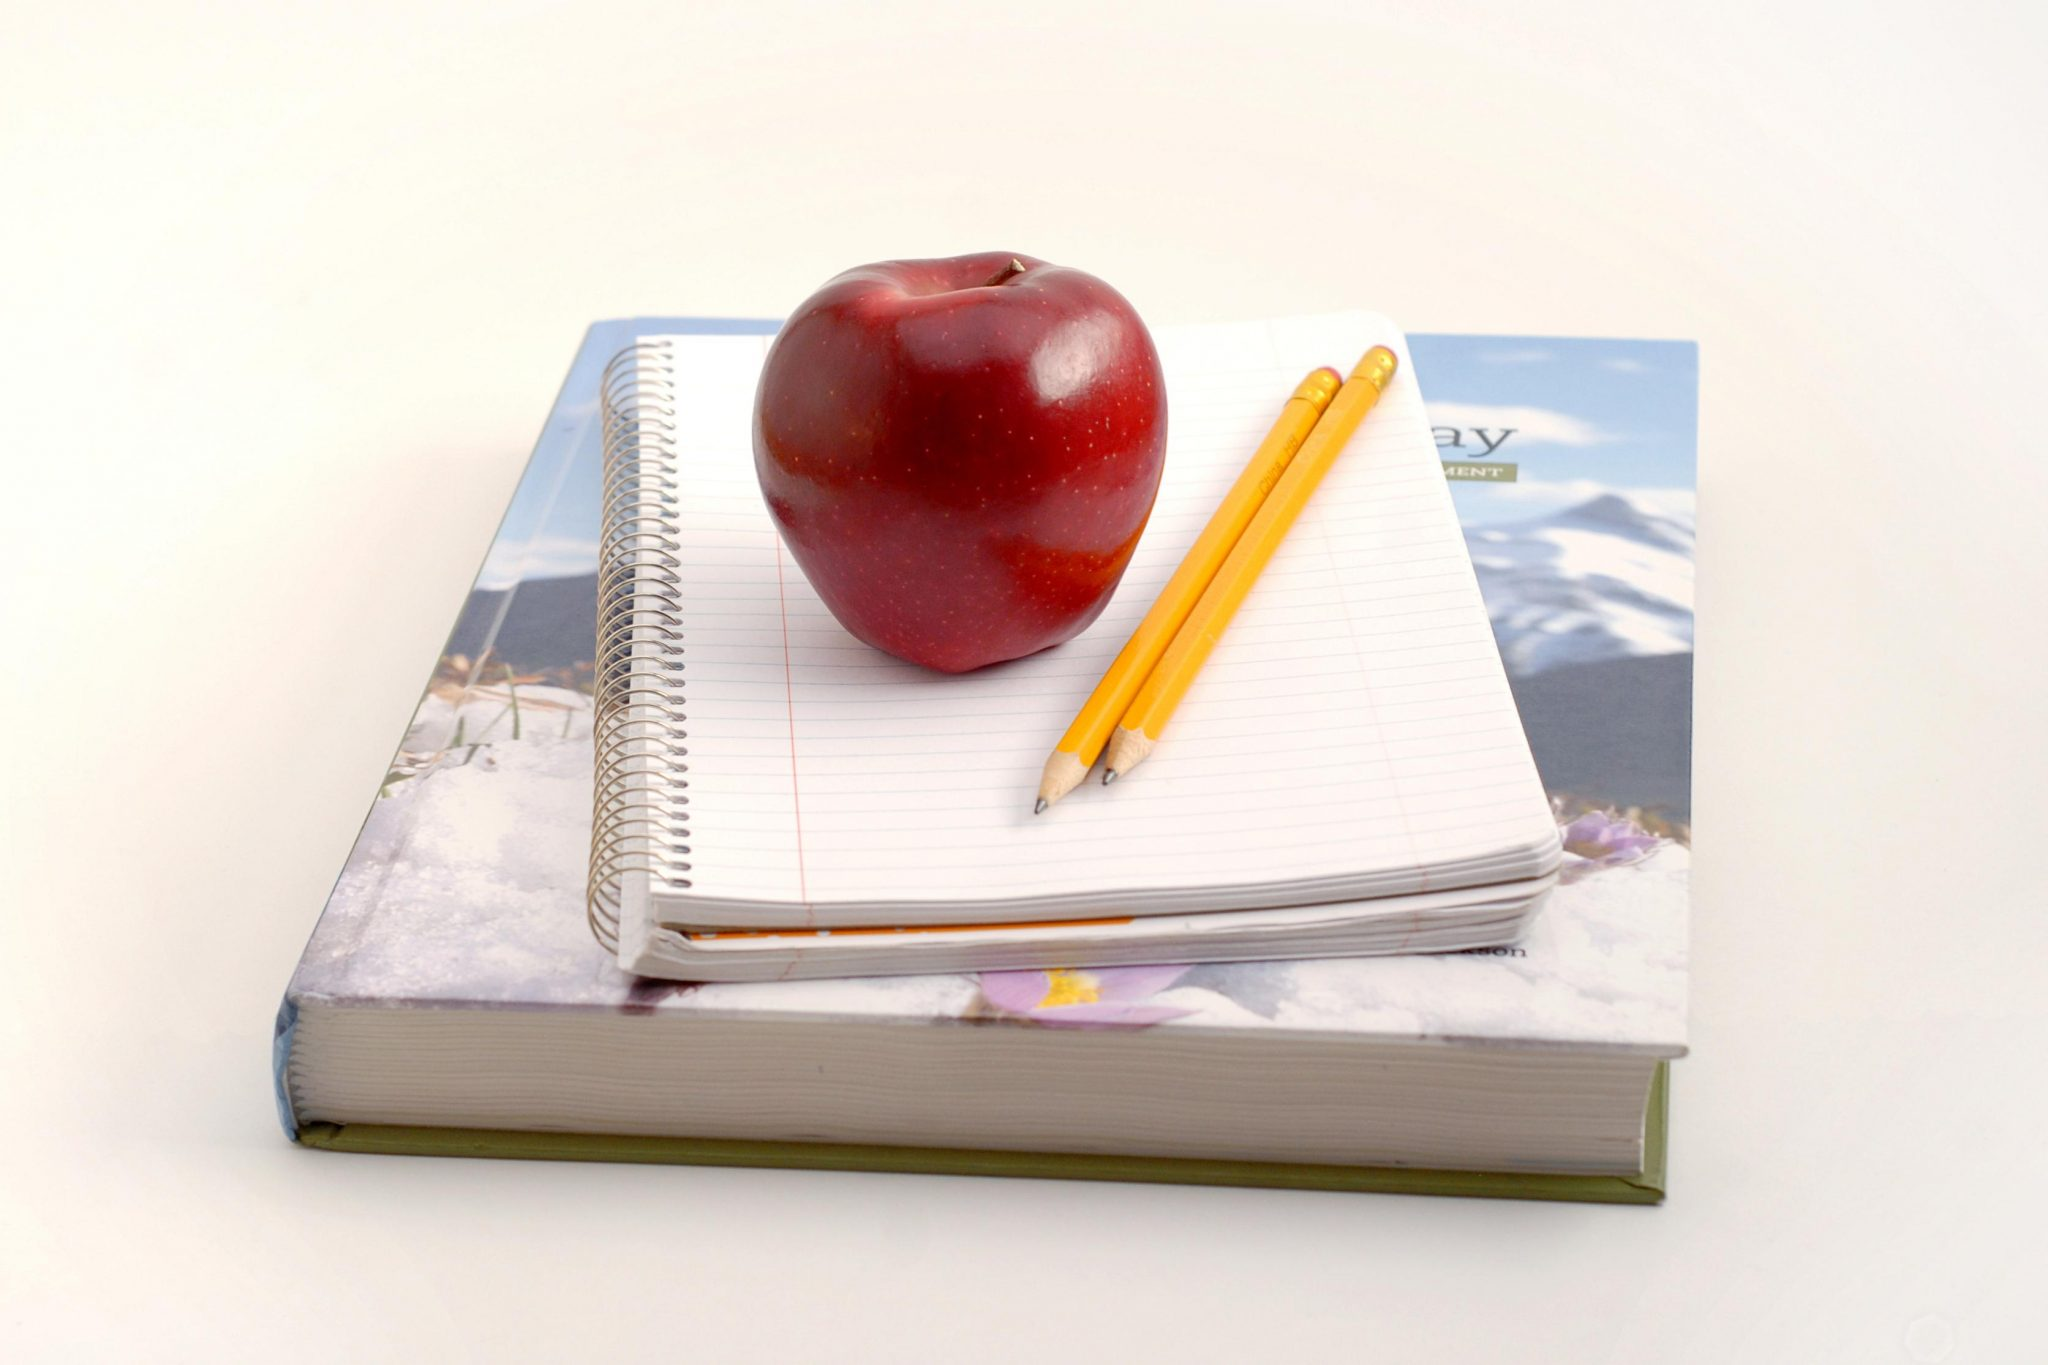 apple-and-books.jpg